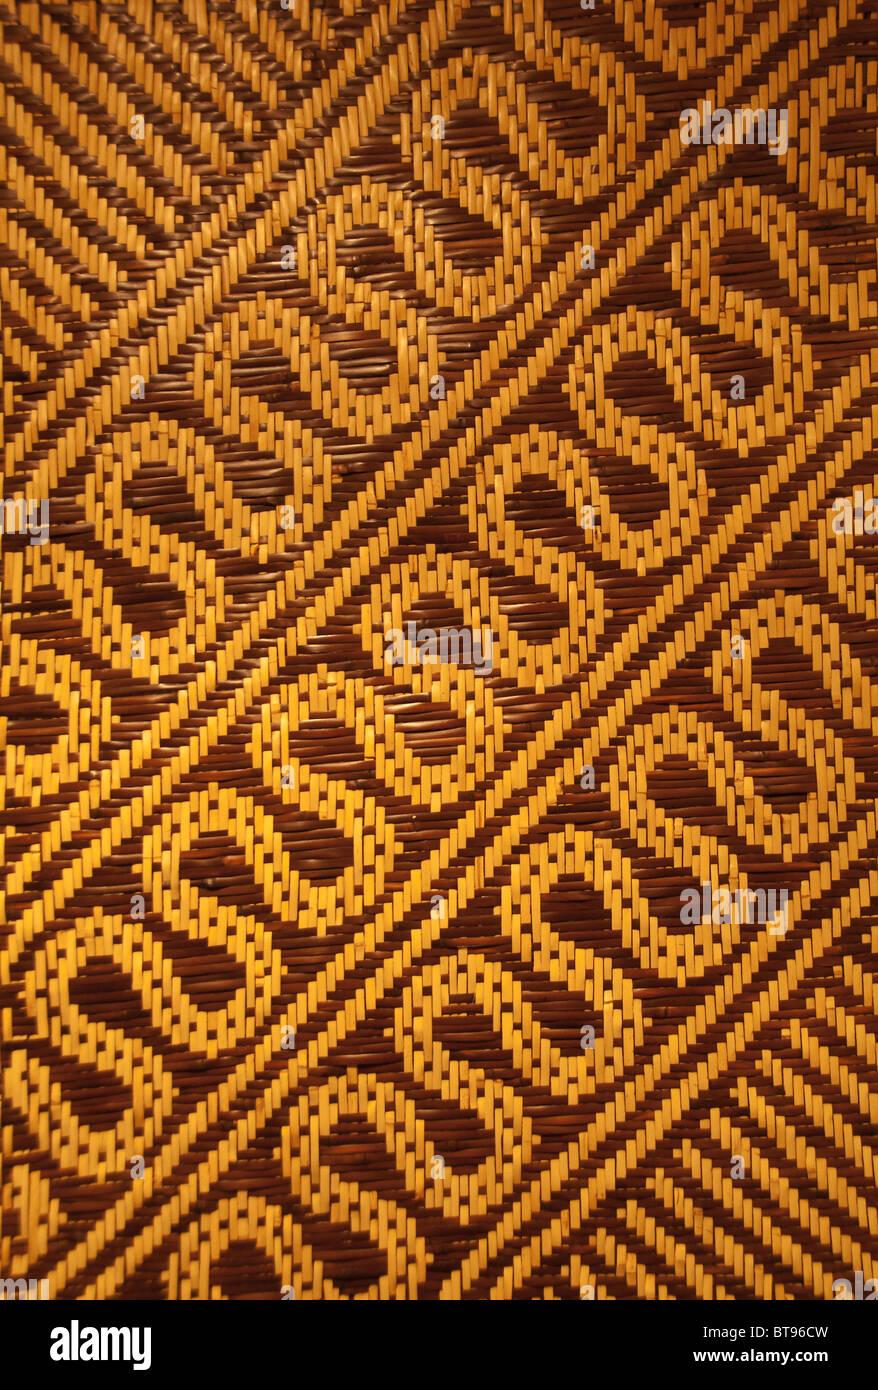 River cane mat from Eastern Band of Cherokee Indians, Cherokee, North Carolina, USA Stock Photo